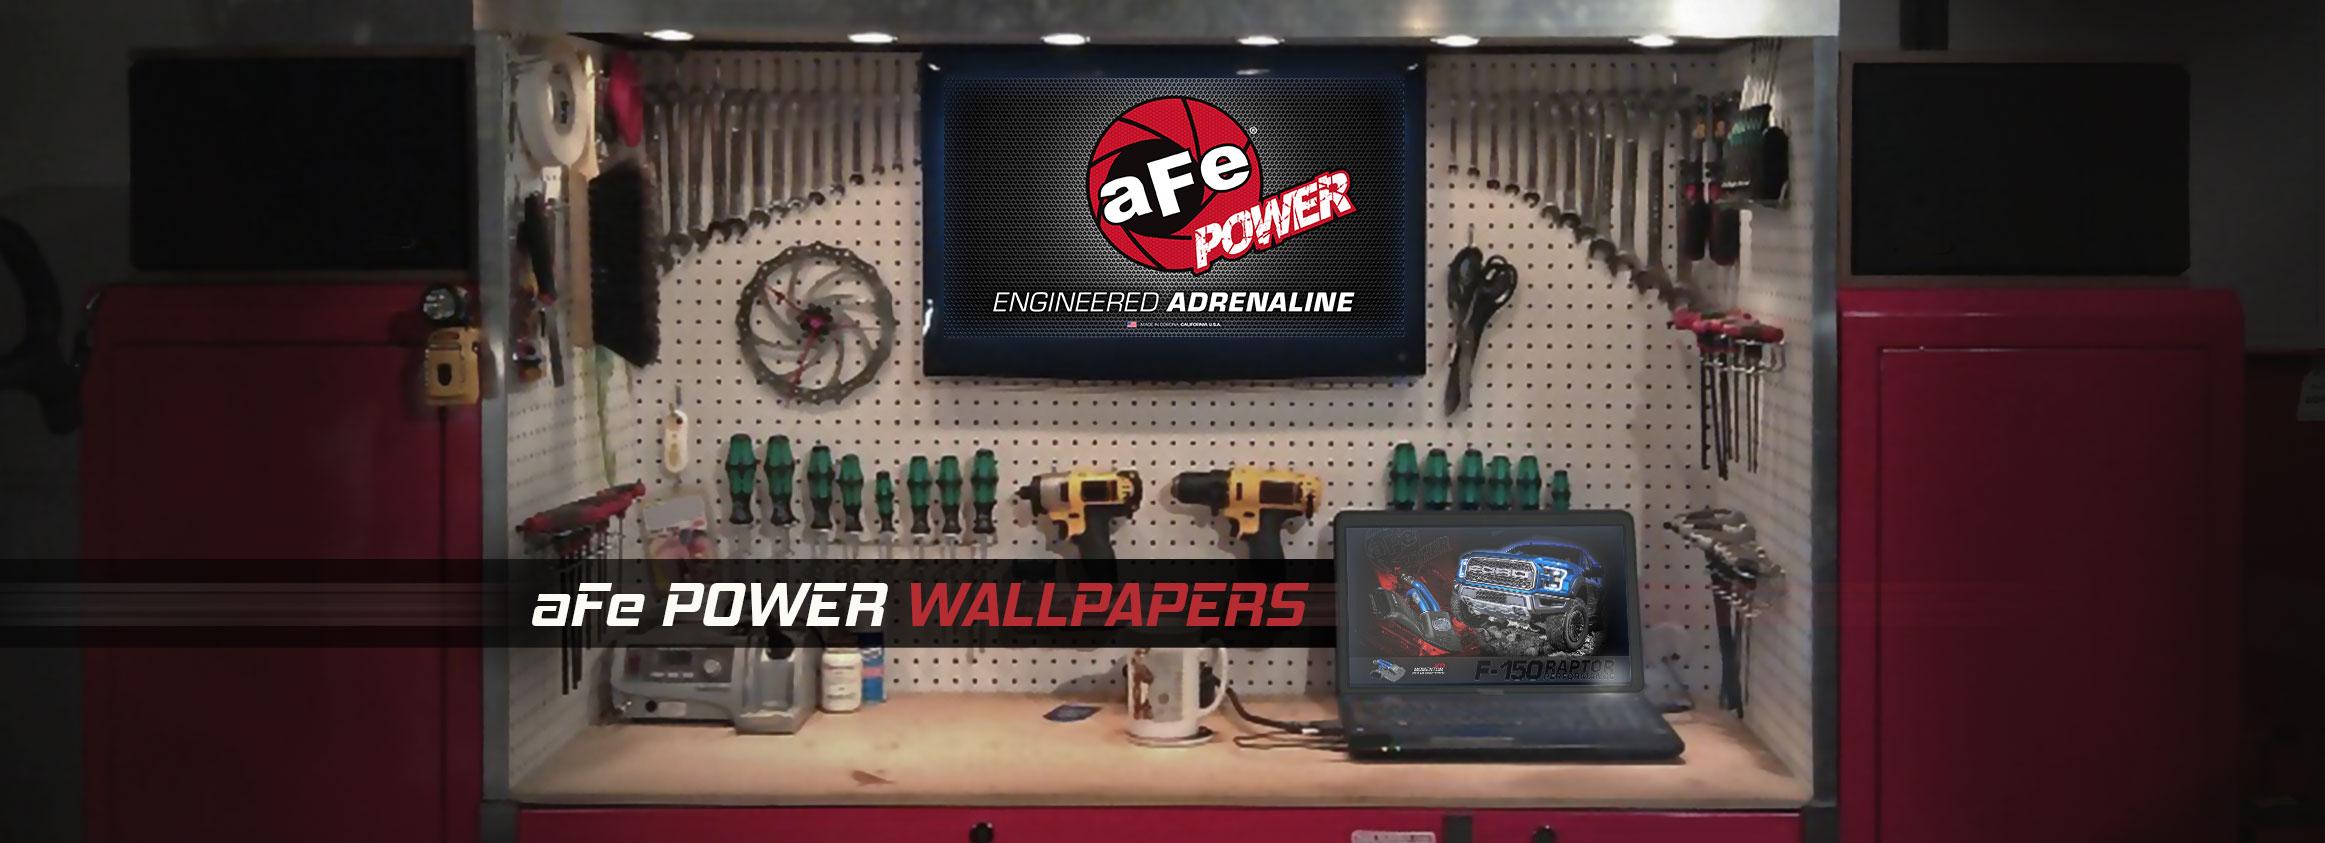 WallpaperHeader